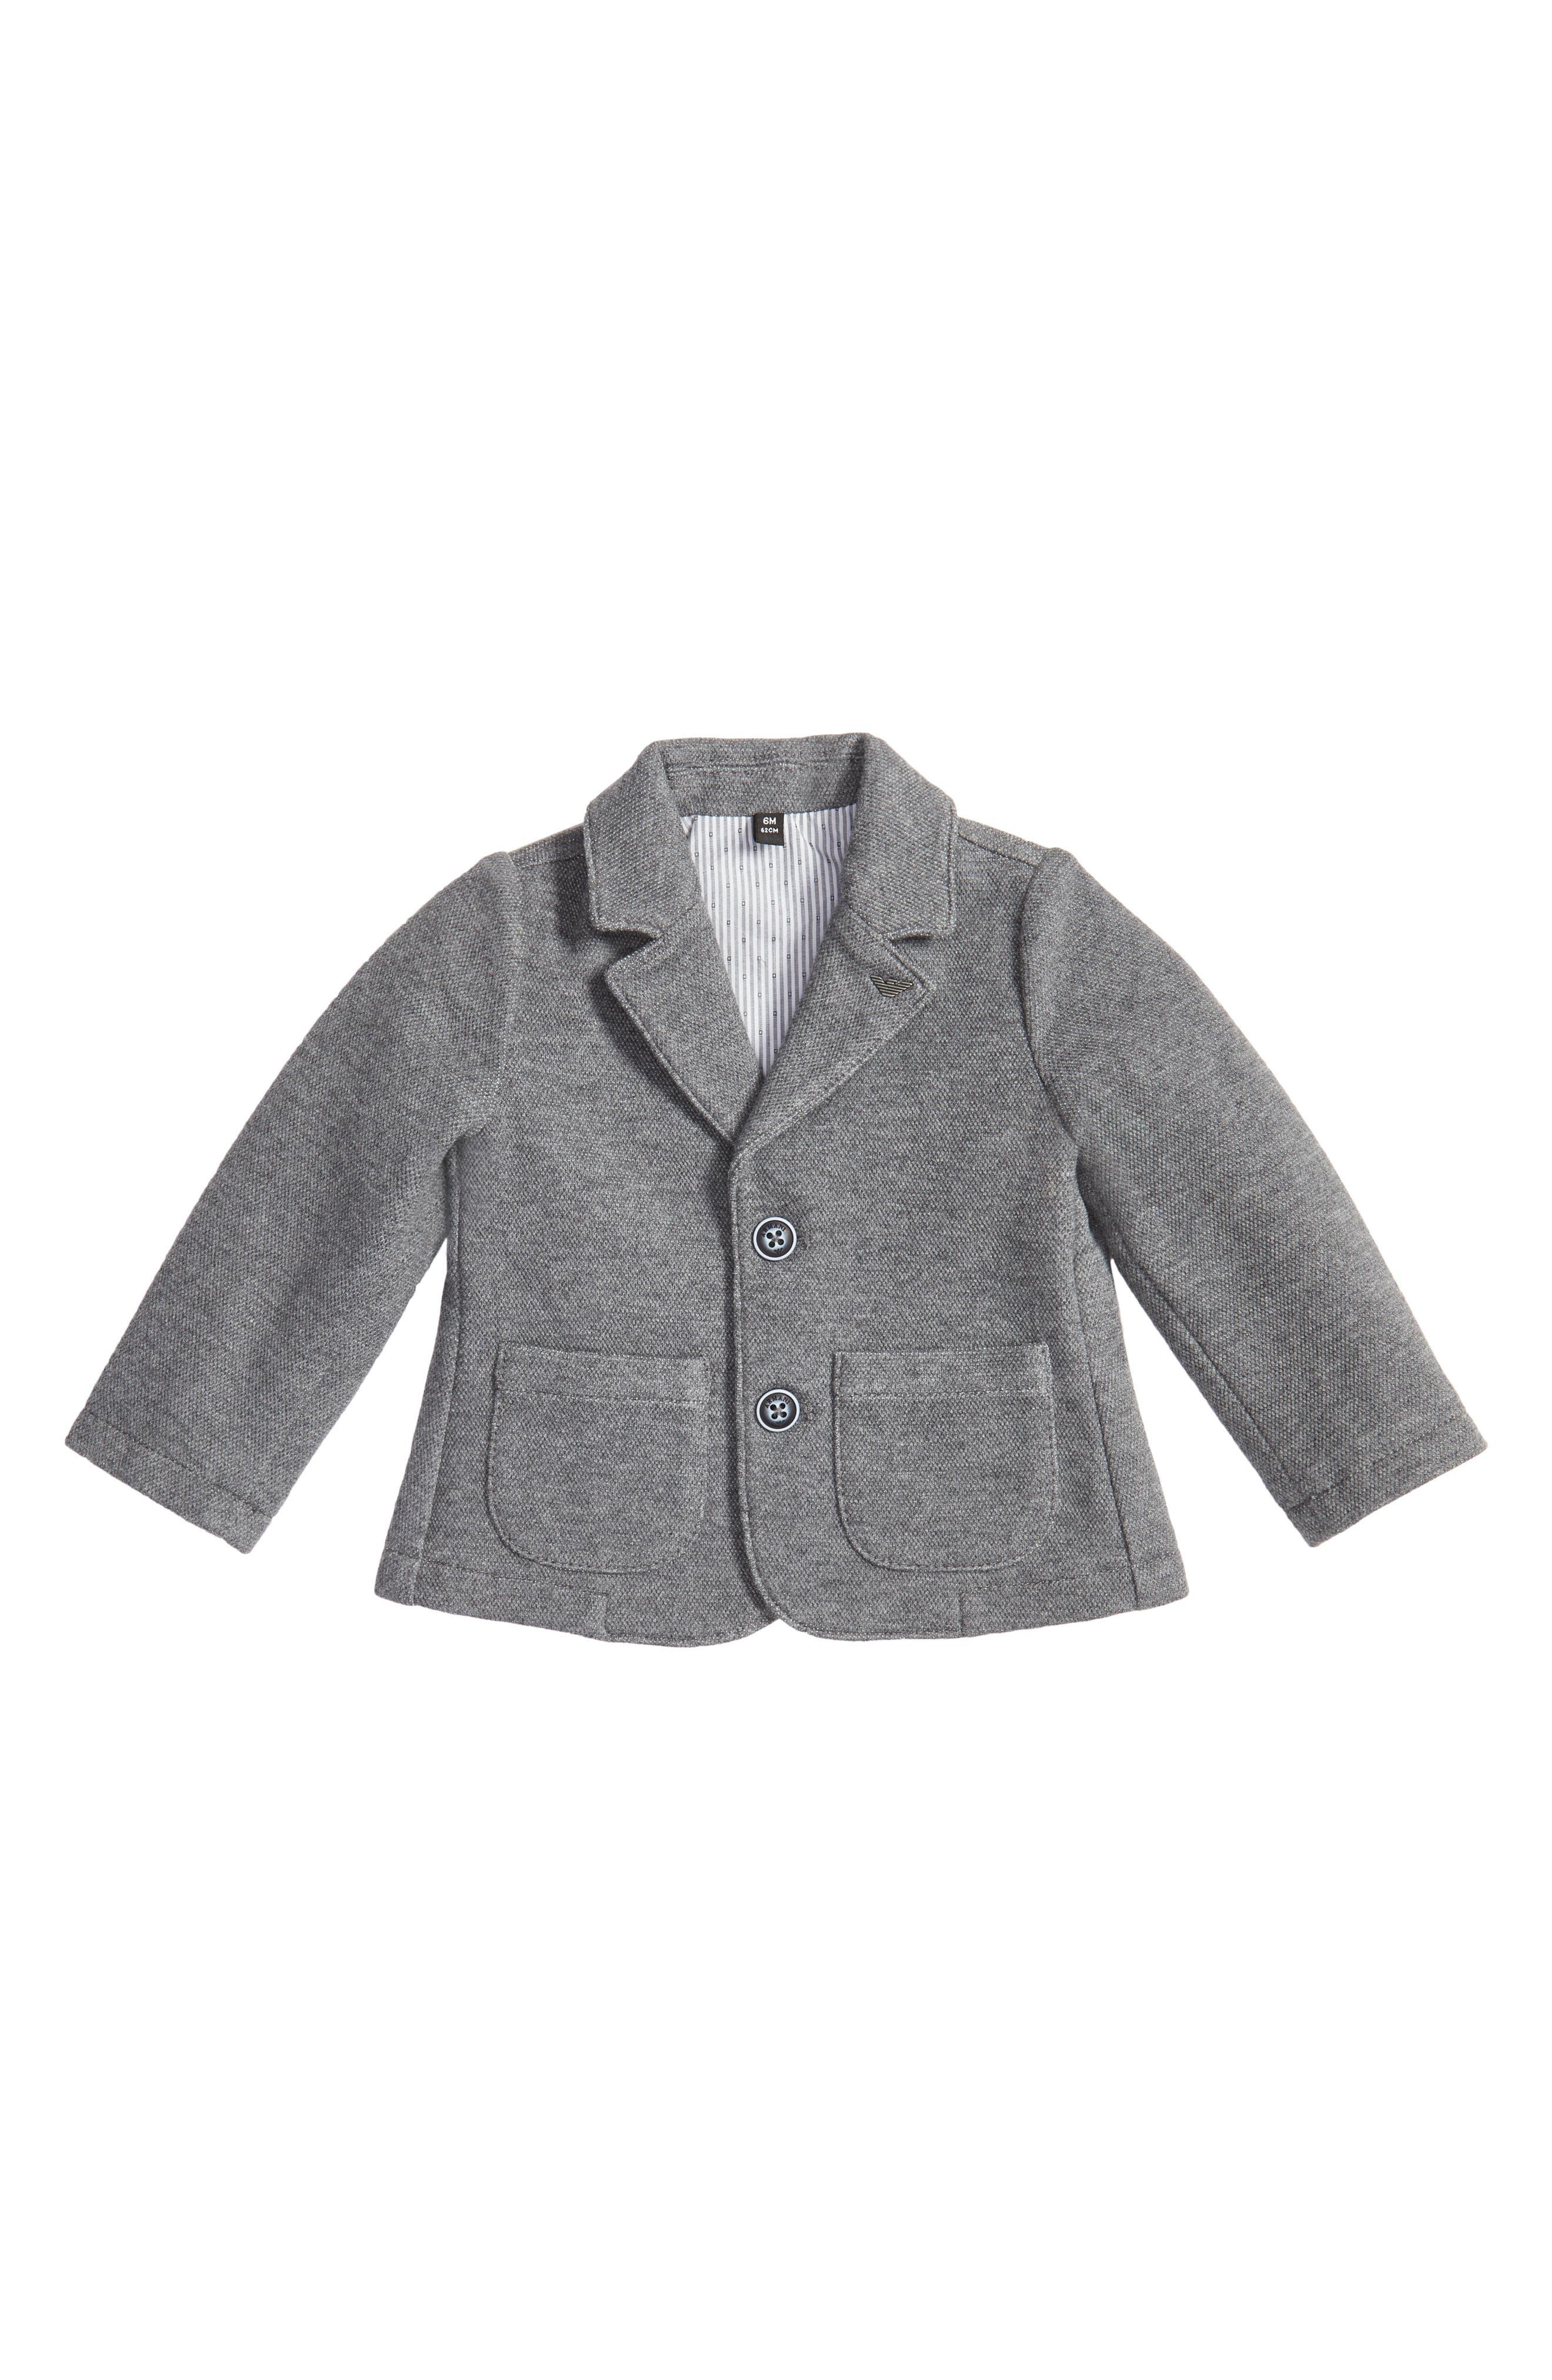 Armani Junior Piqué Knit Blazer (Baby Boys)